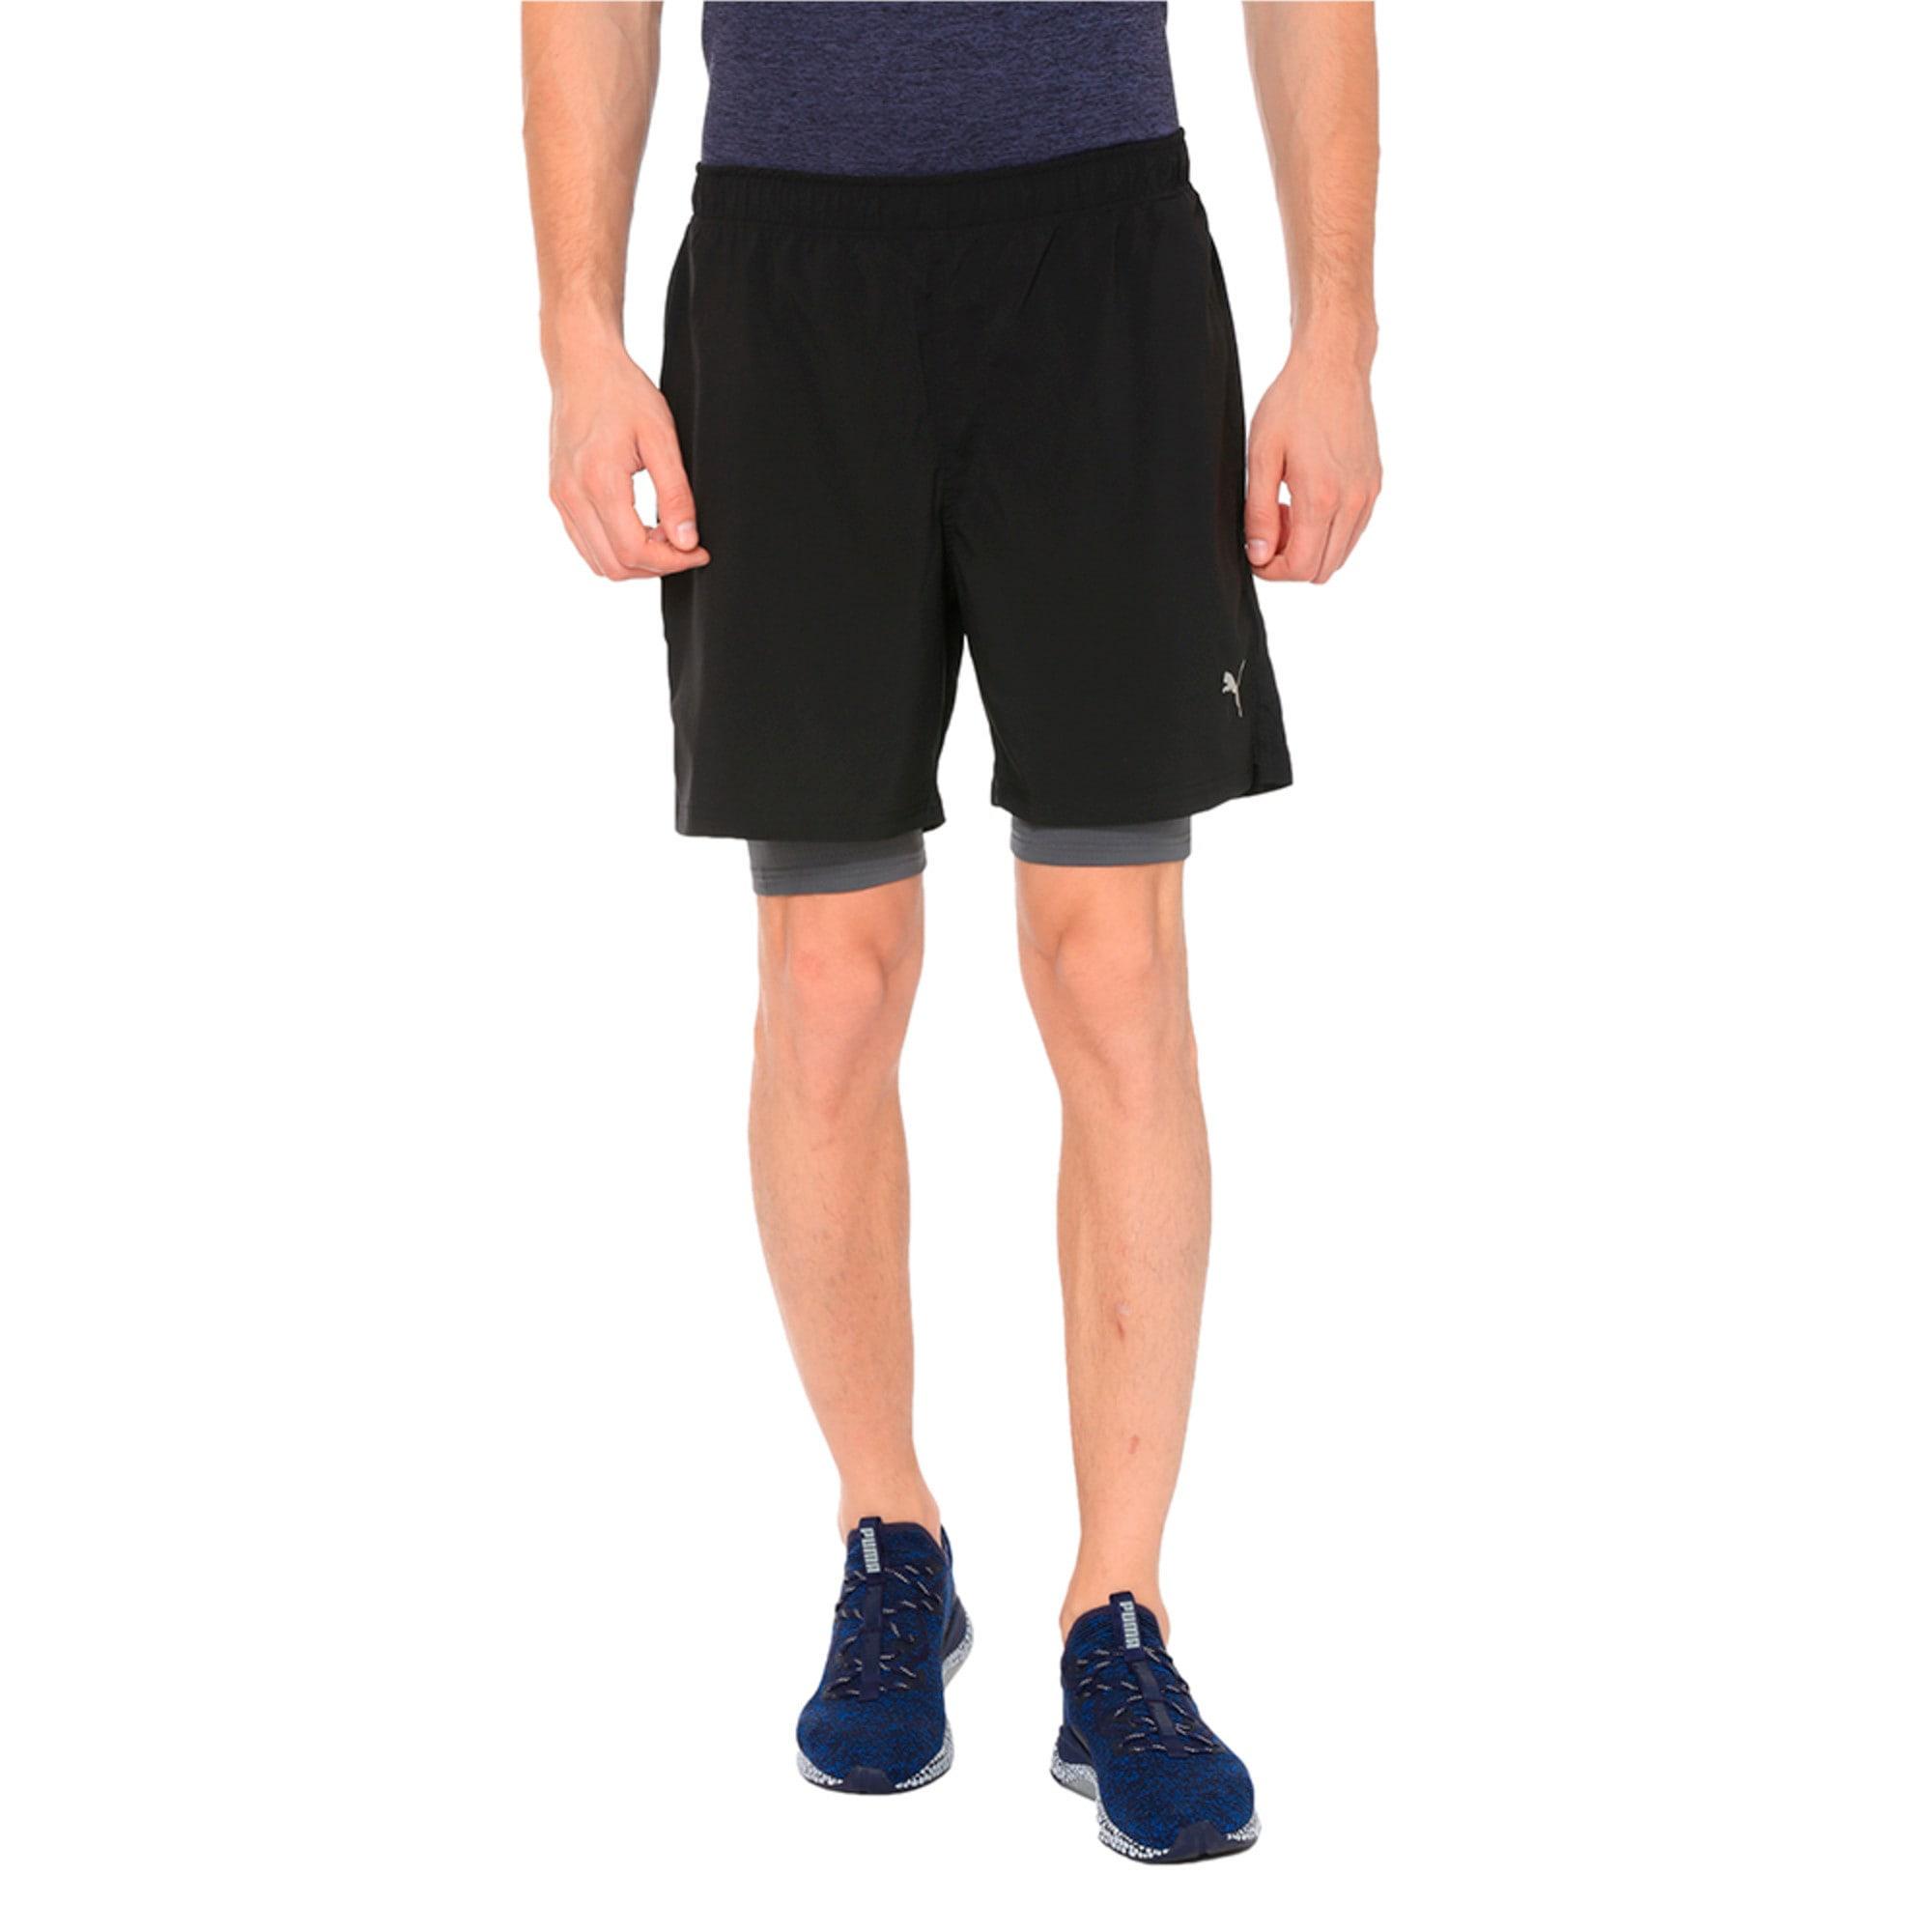 Thumbnail 1 of Running Men's IGNITE 2-in-1 Shorts, Puma Black, medium-IND